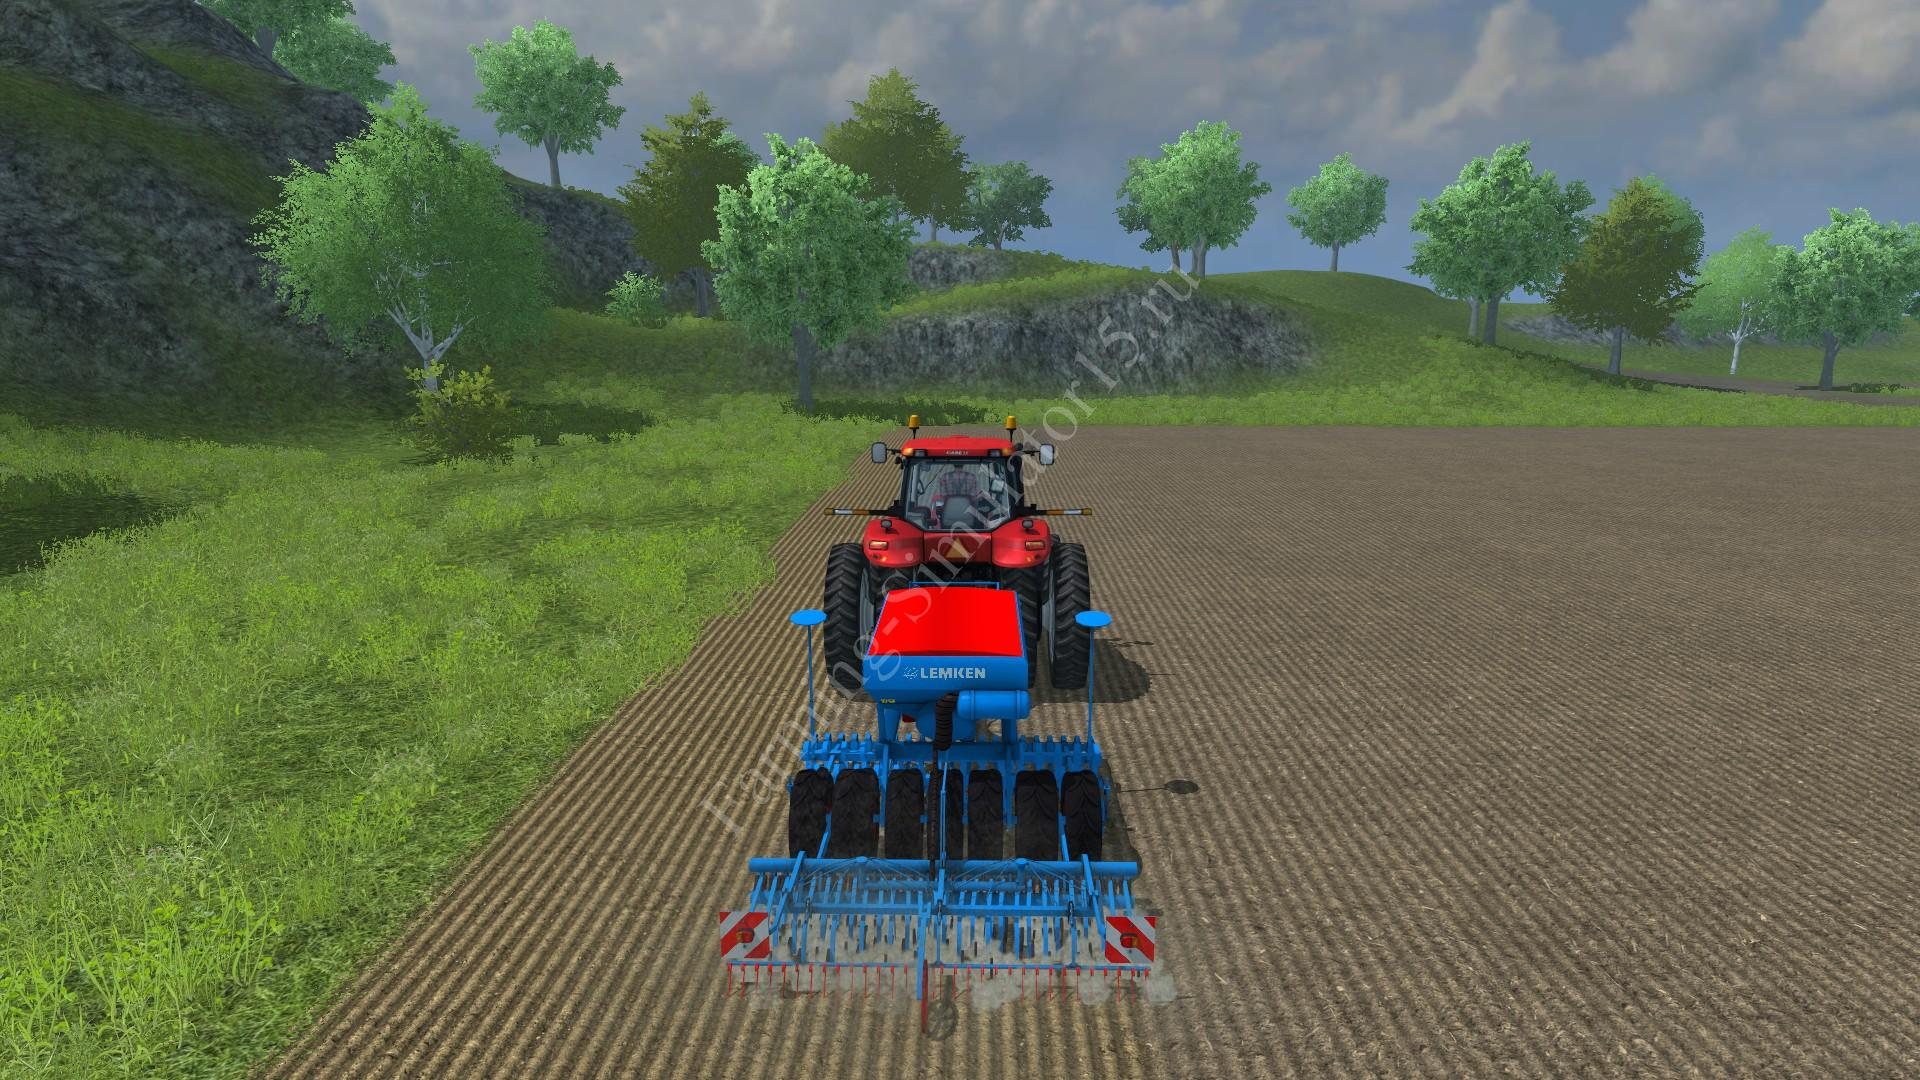 Мод сеялки Lemken COMPACT Soitair 9H v 1.0 Farming Simulator 2013, Farming Simulator 13